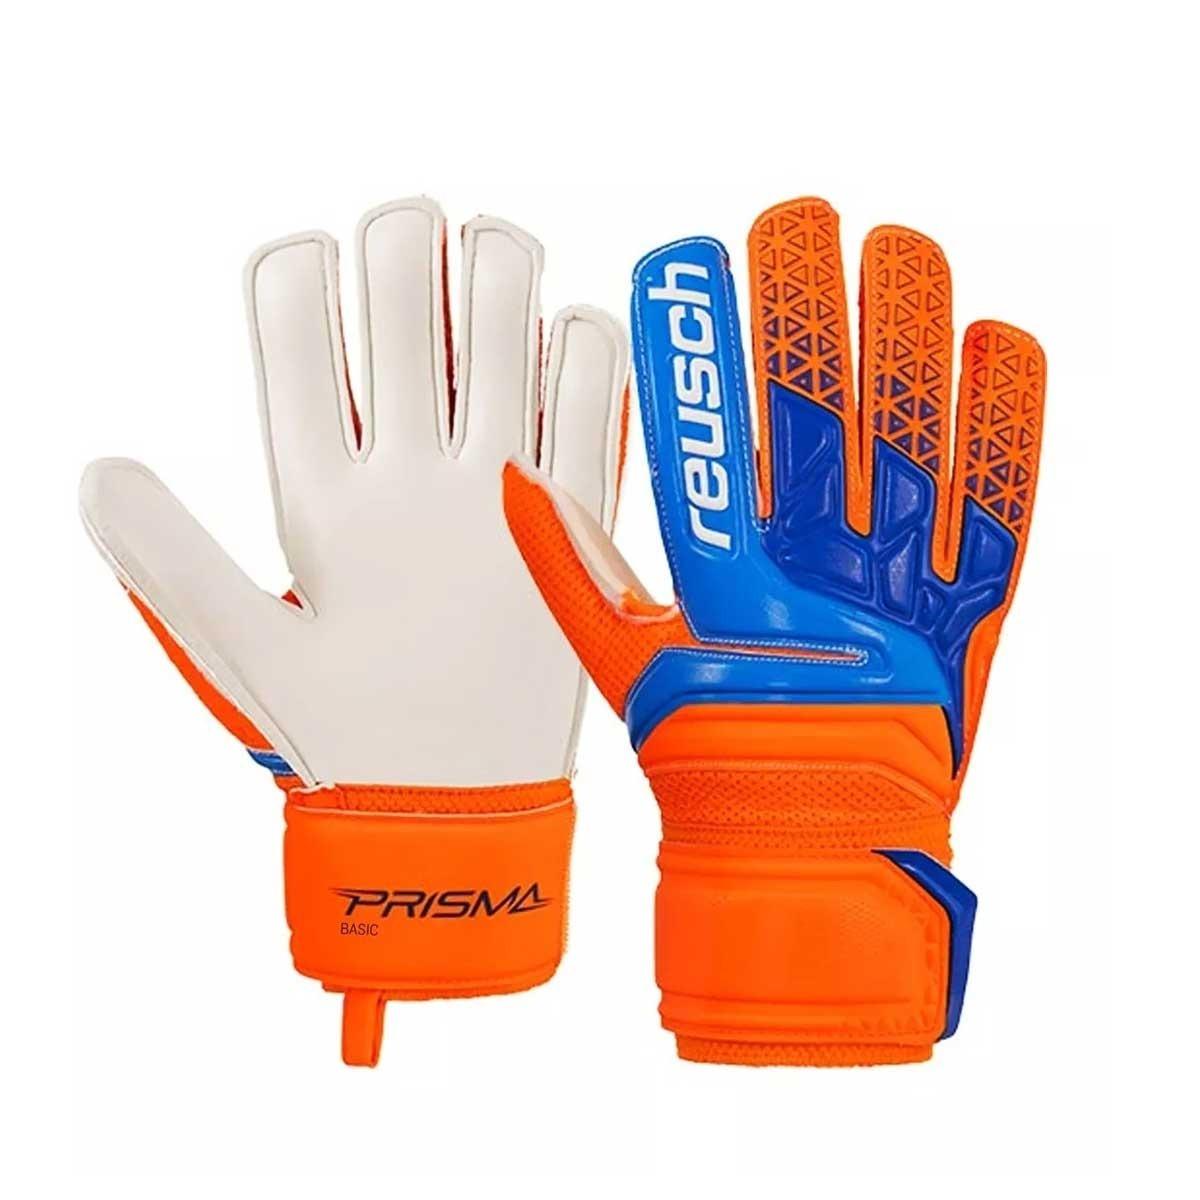 32895761953a0 guantes arquero reusch prisma basic new 2018 na futbol 0948. Cargando zoom.